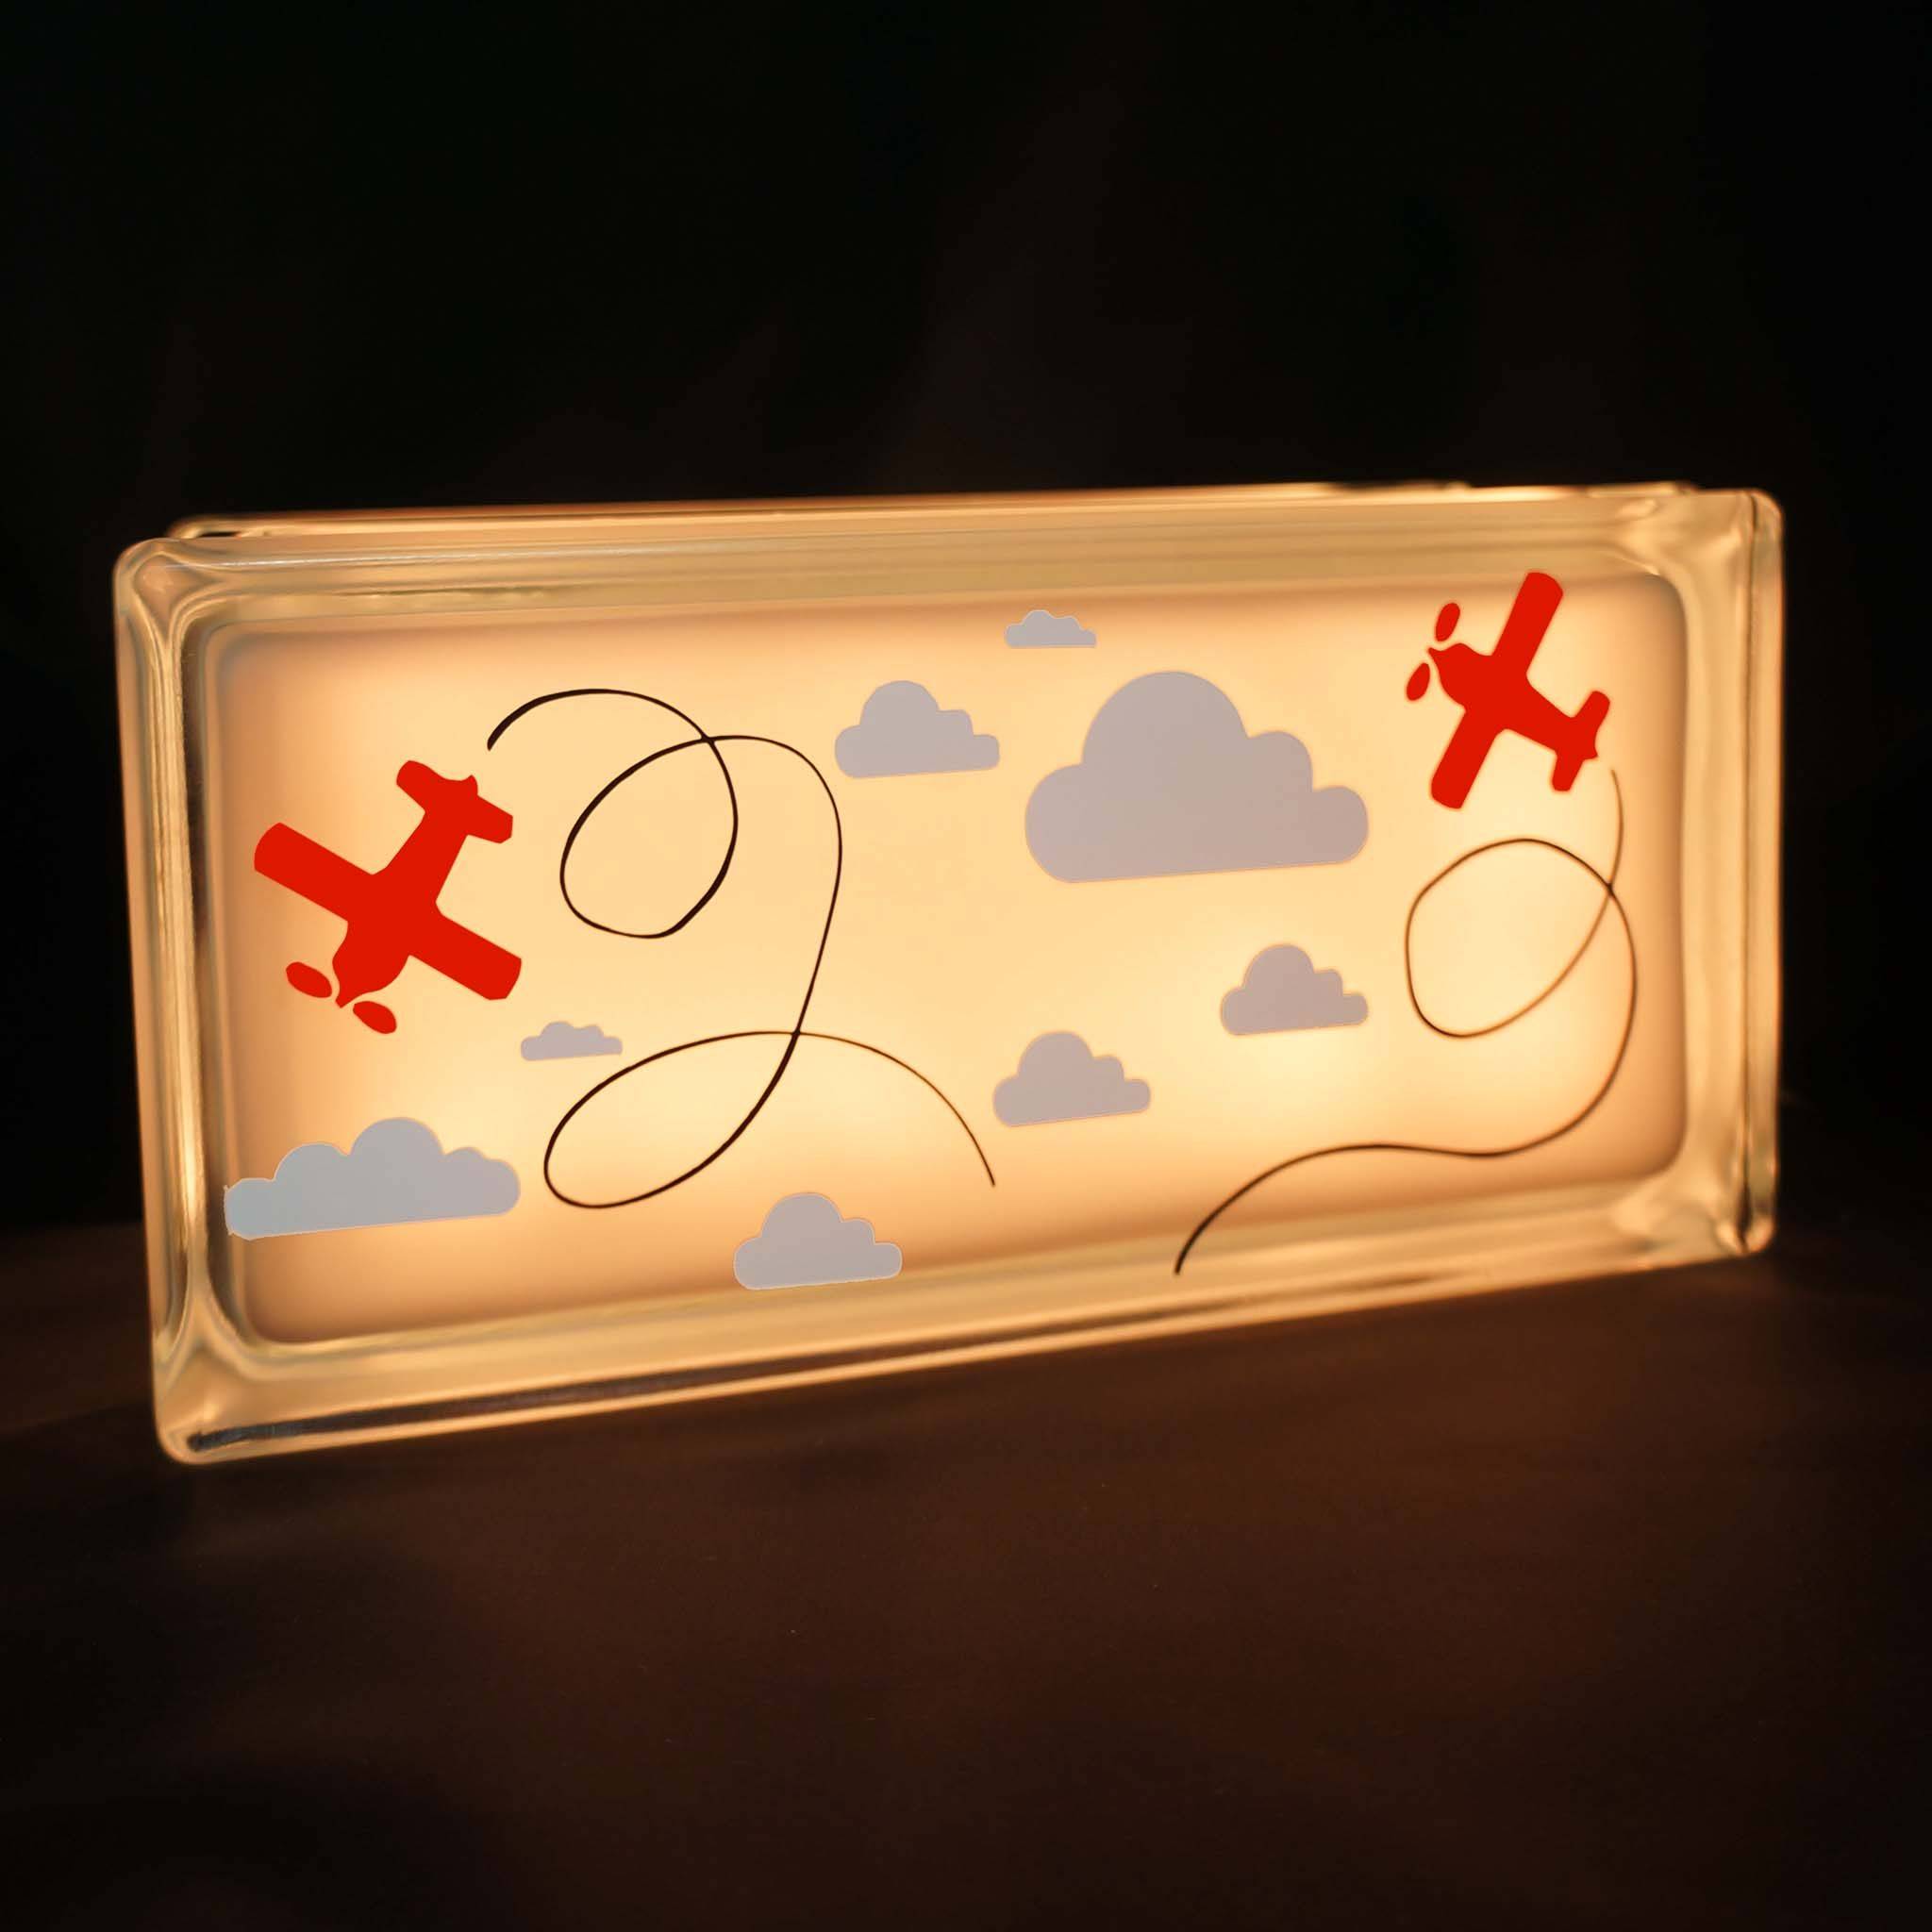 gallery everyday crafts pinterest night light glass blocks